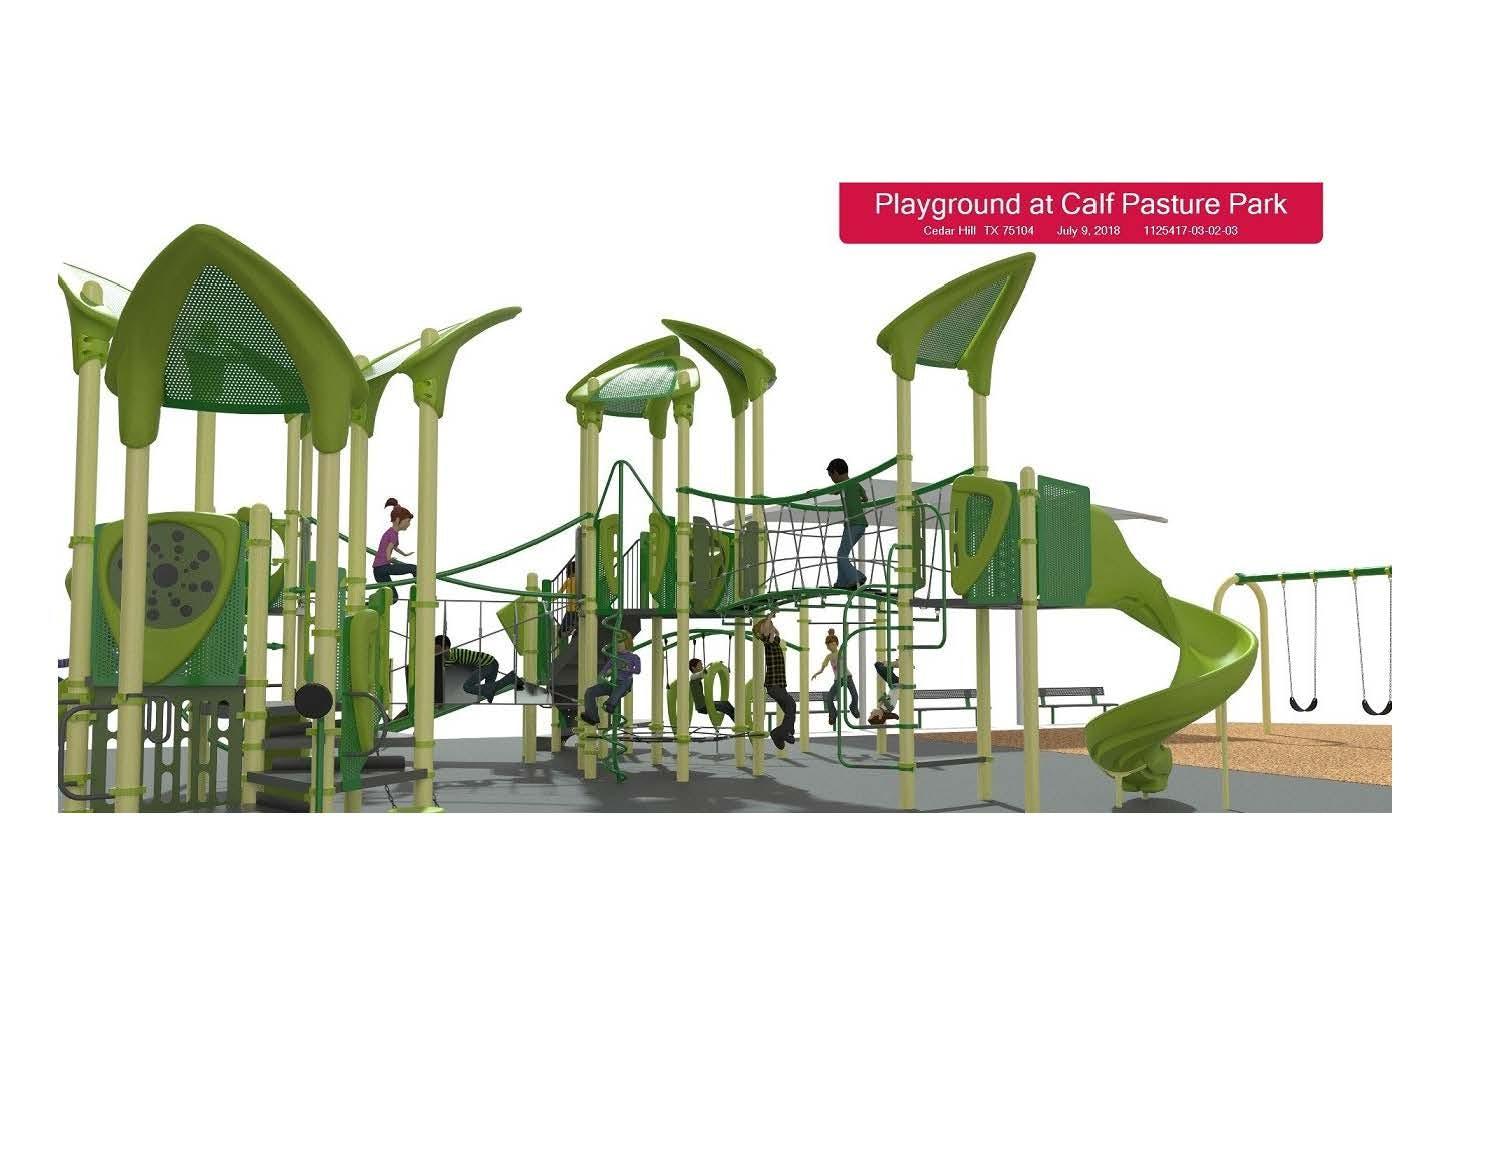 Calf Pasture Playground Concept